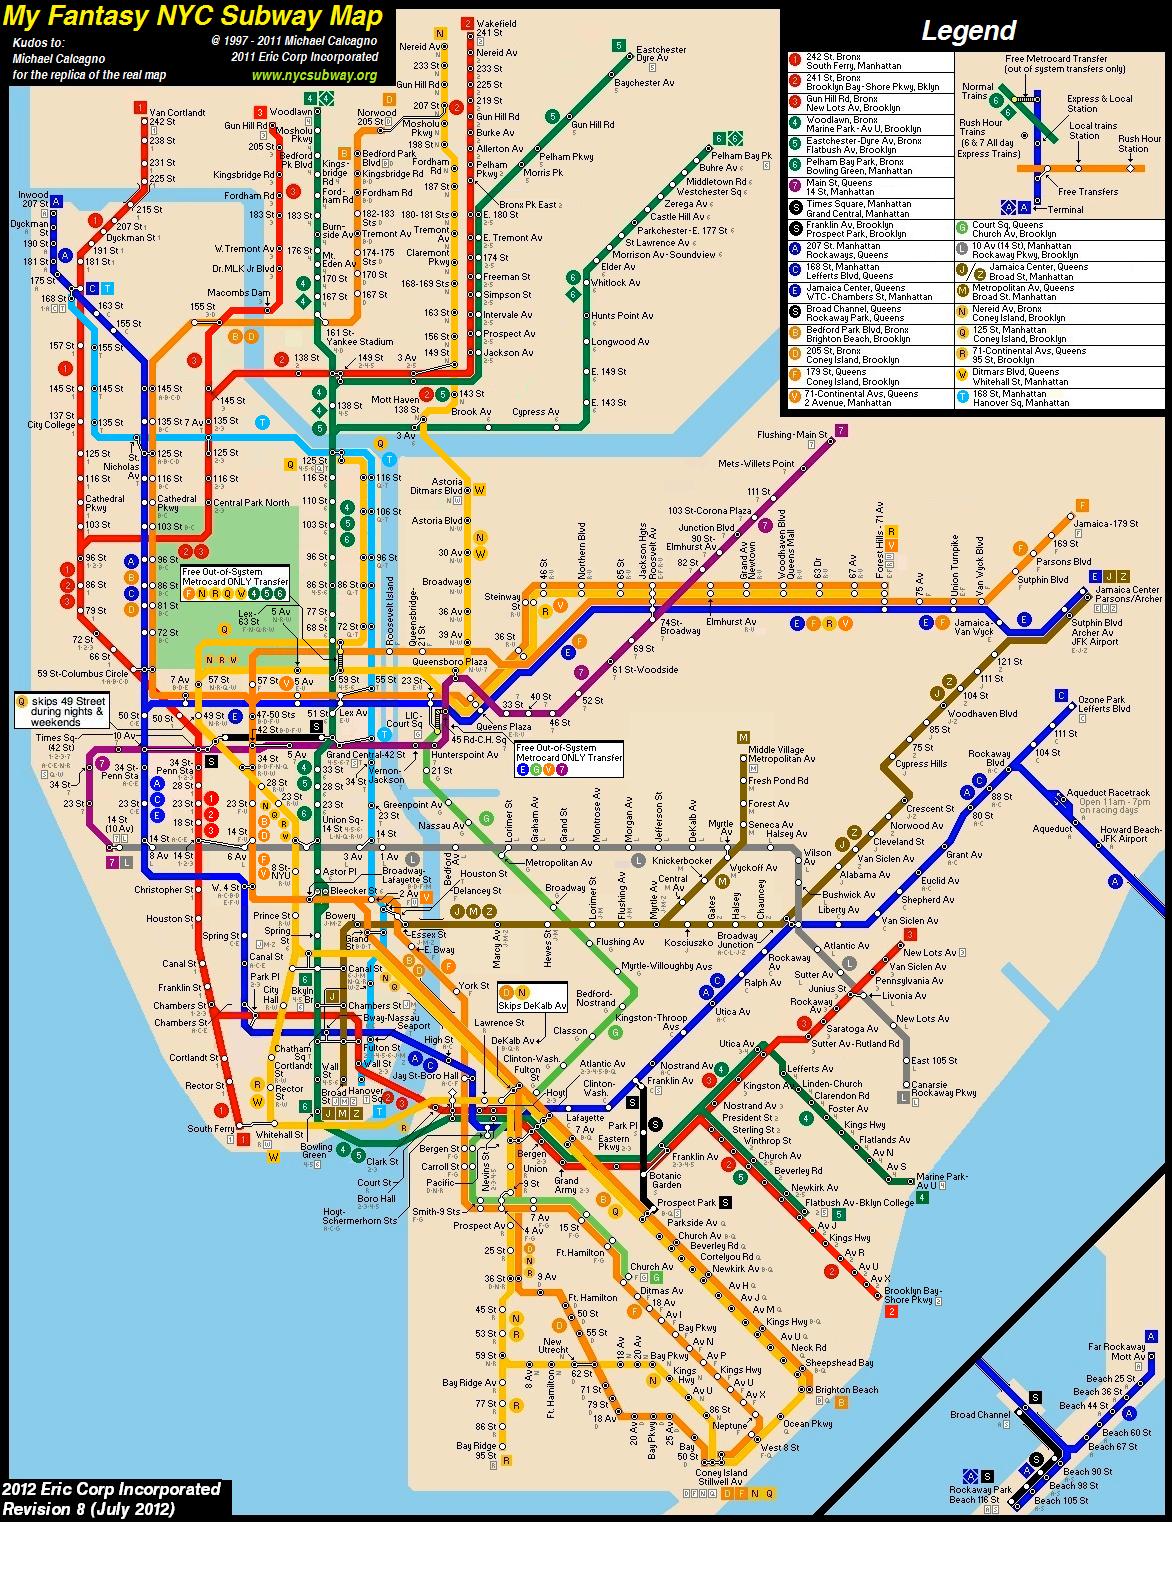 Nyc Subway Map F Lne.Fantasy Nyc Subway Map Revision 8 By Ecinc2xxx On Deviantart